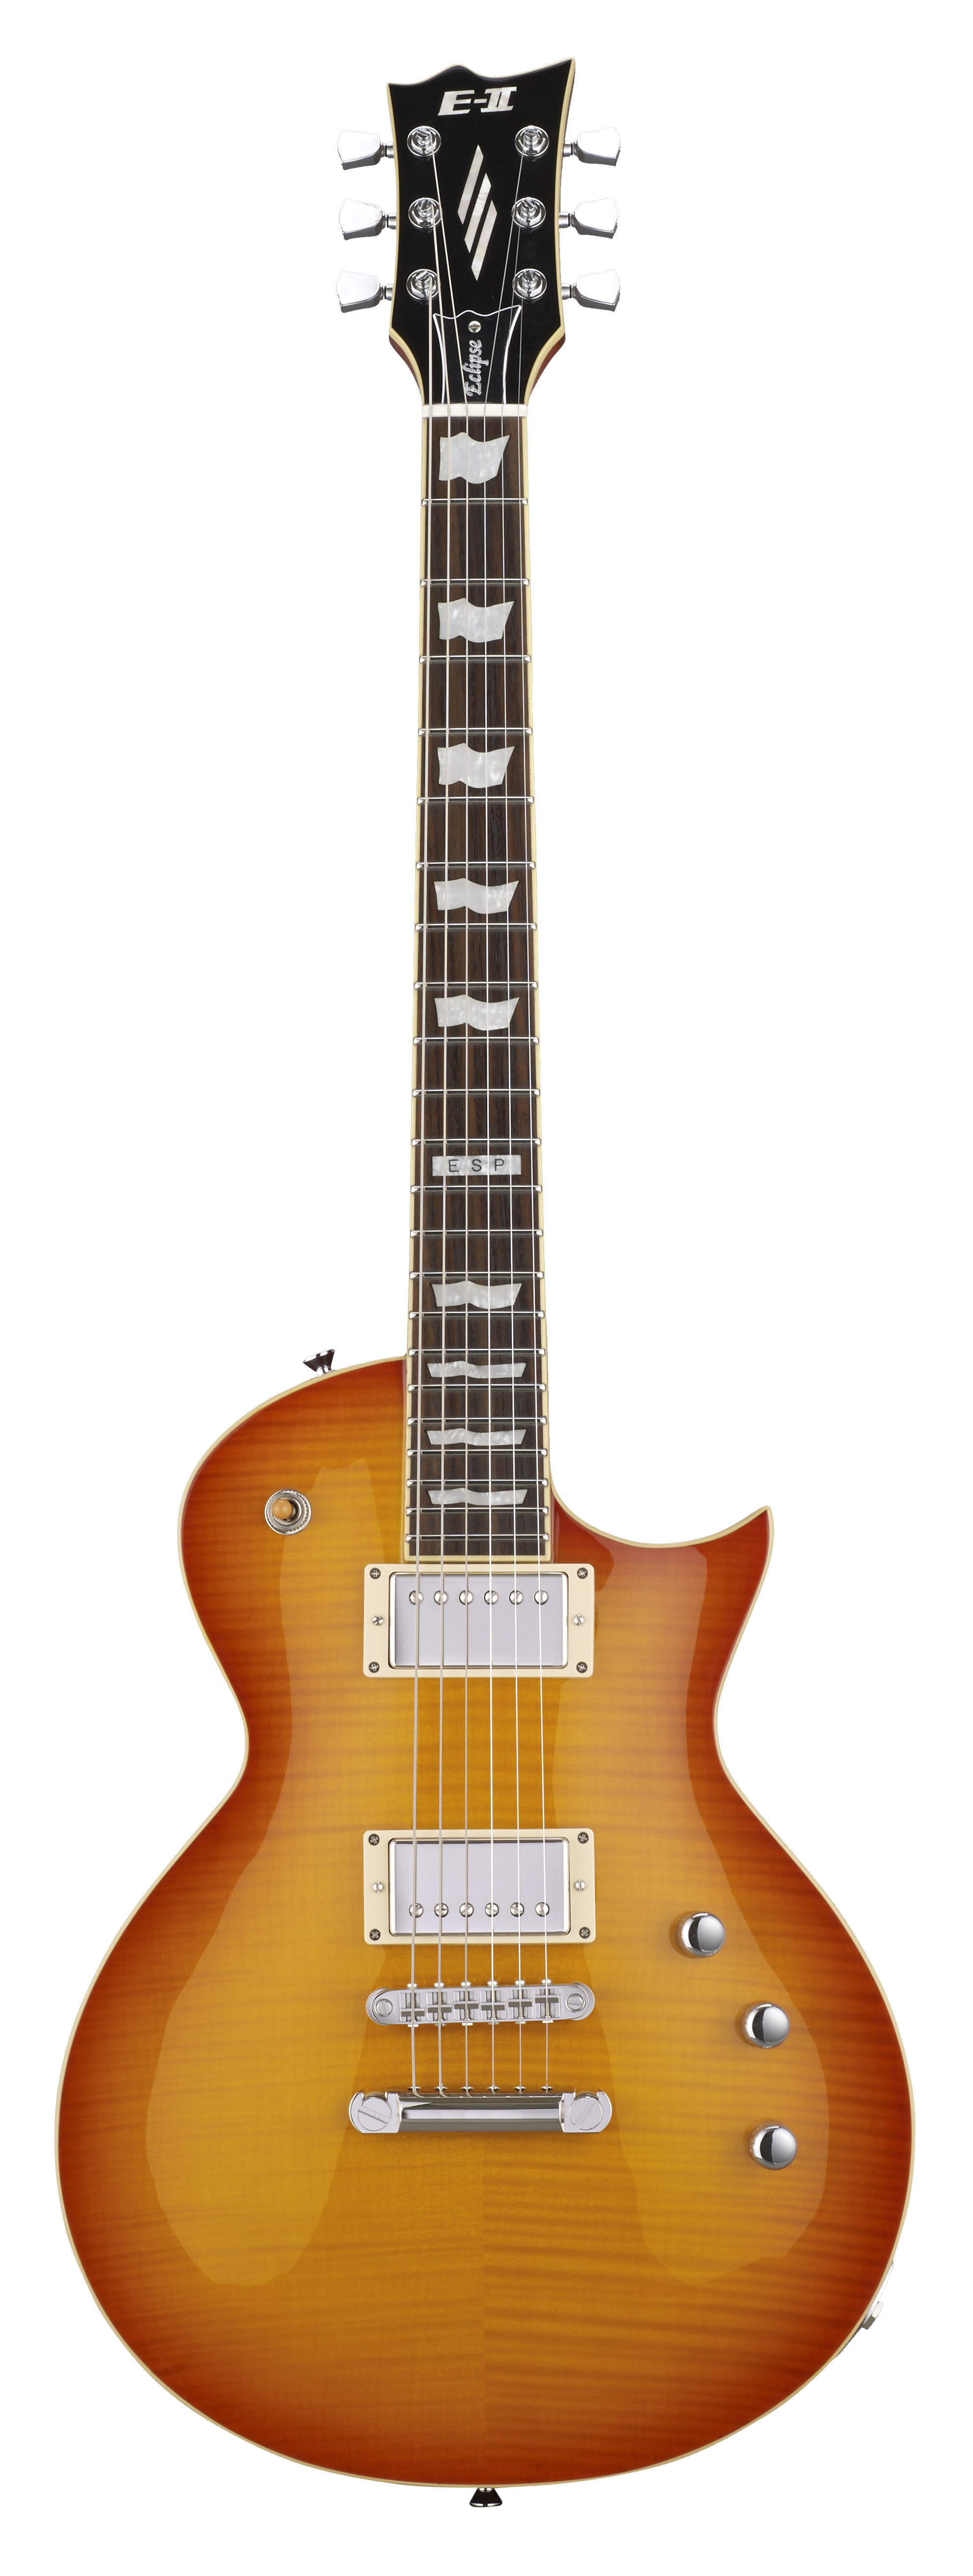 ESP ECLIPSE FM VHB E-II Electric Guitar with Seymour Duncans Pickups and Vintage Honey Burst Finish